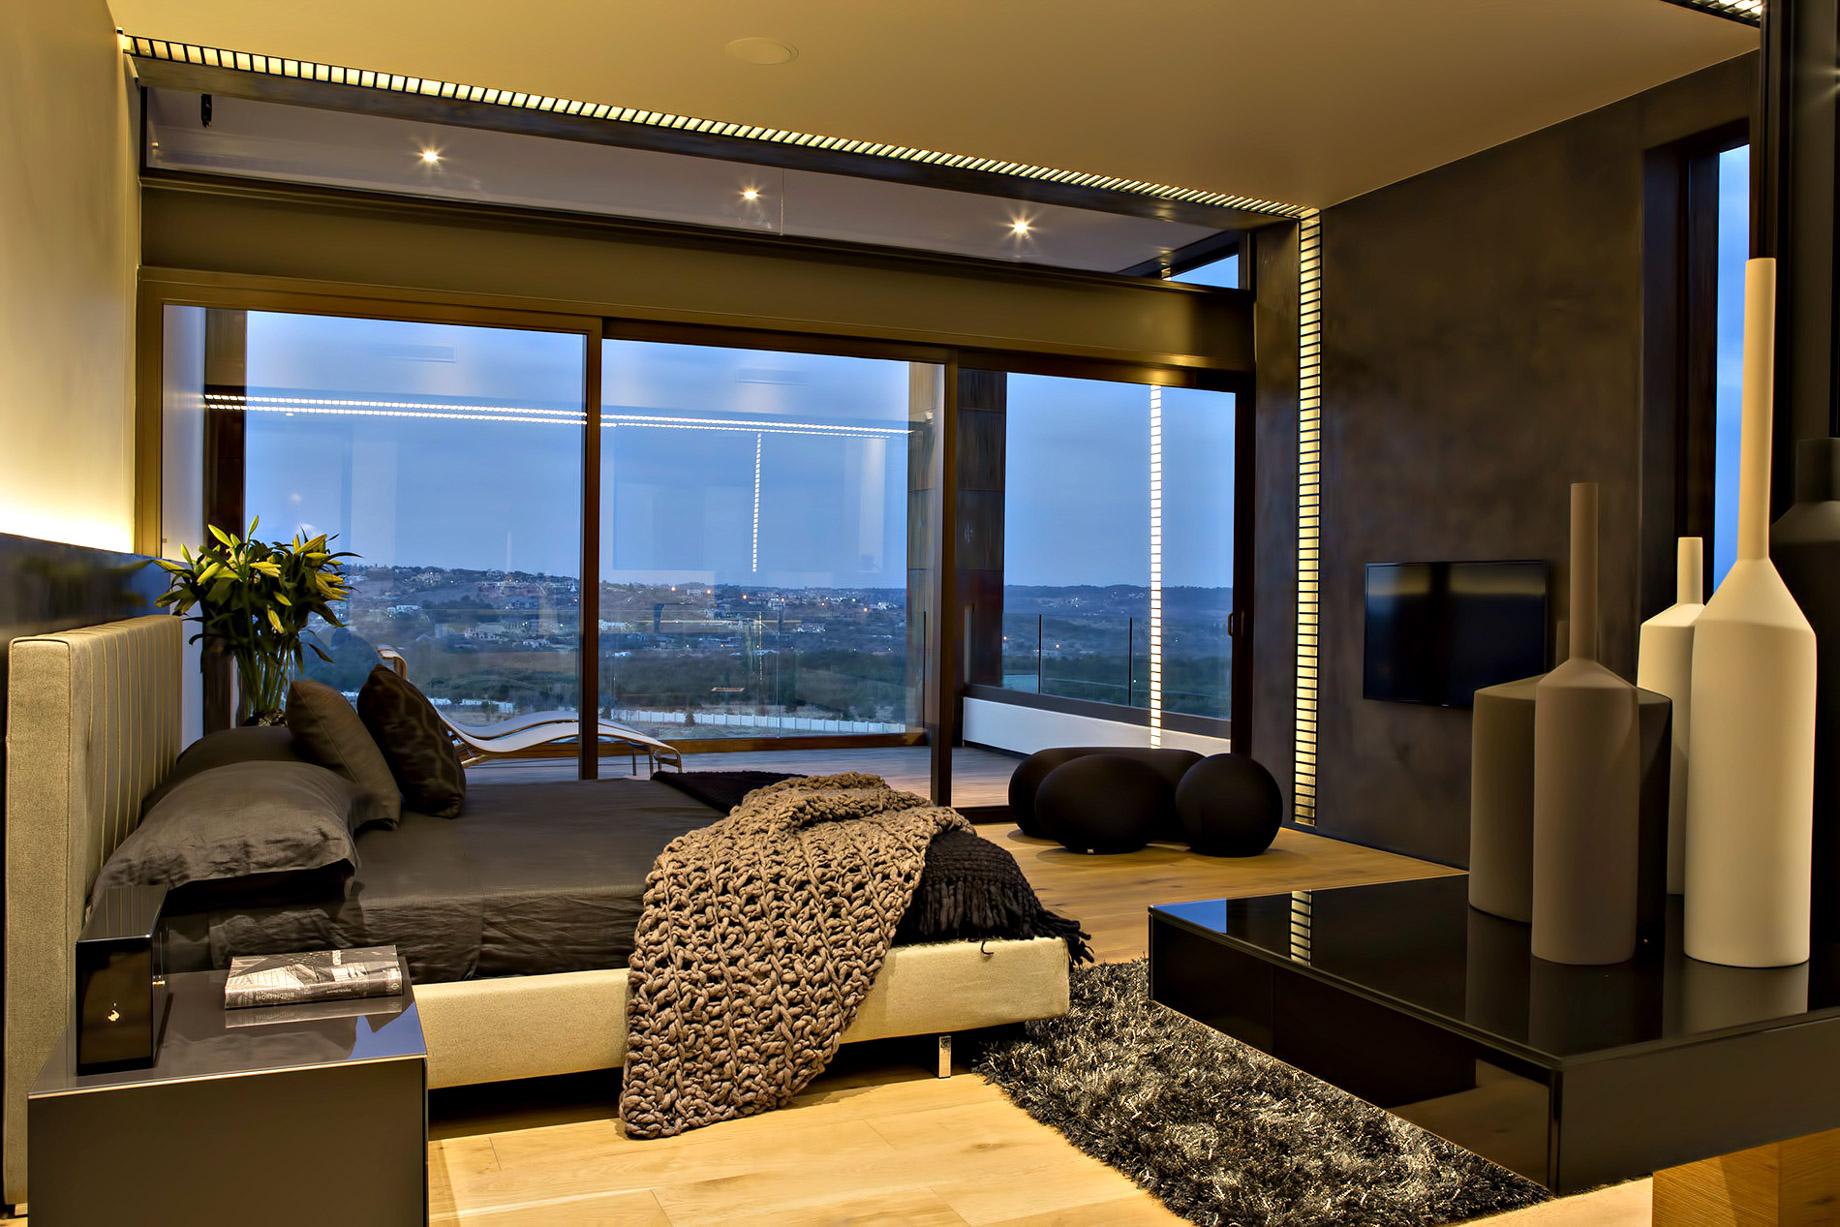 Boz House Luxury Villa – Mooikloof Heights, Pretoria, South Africa